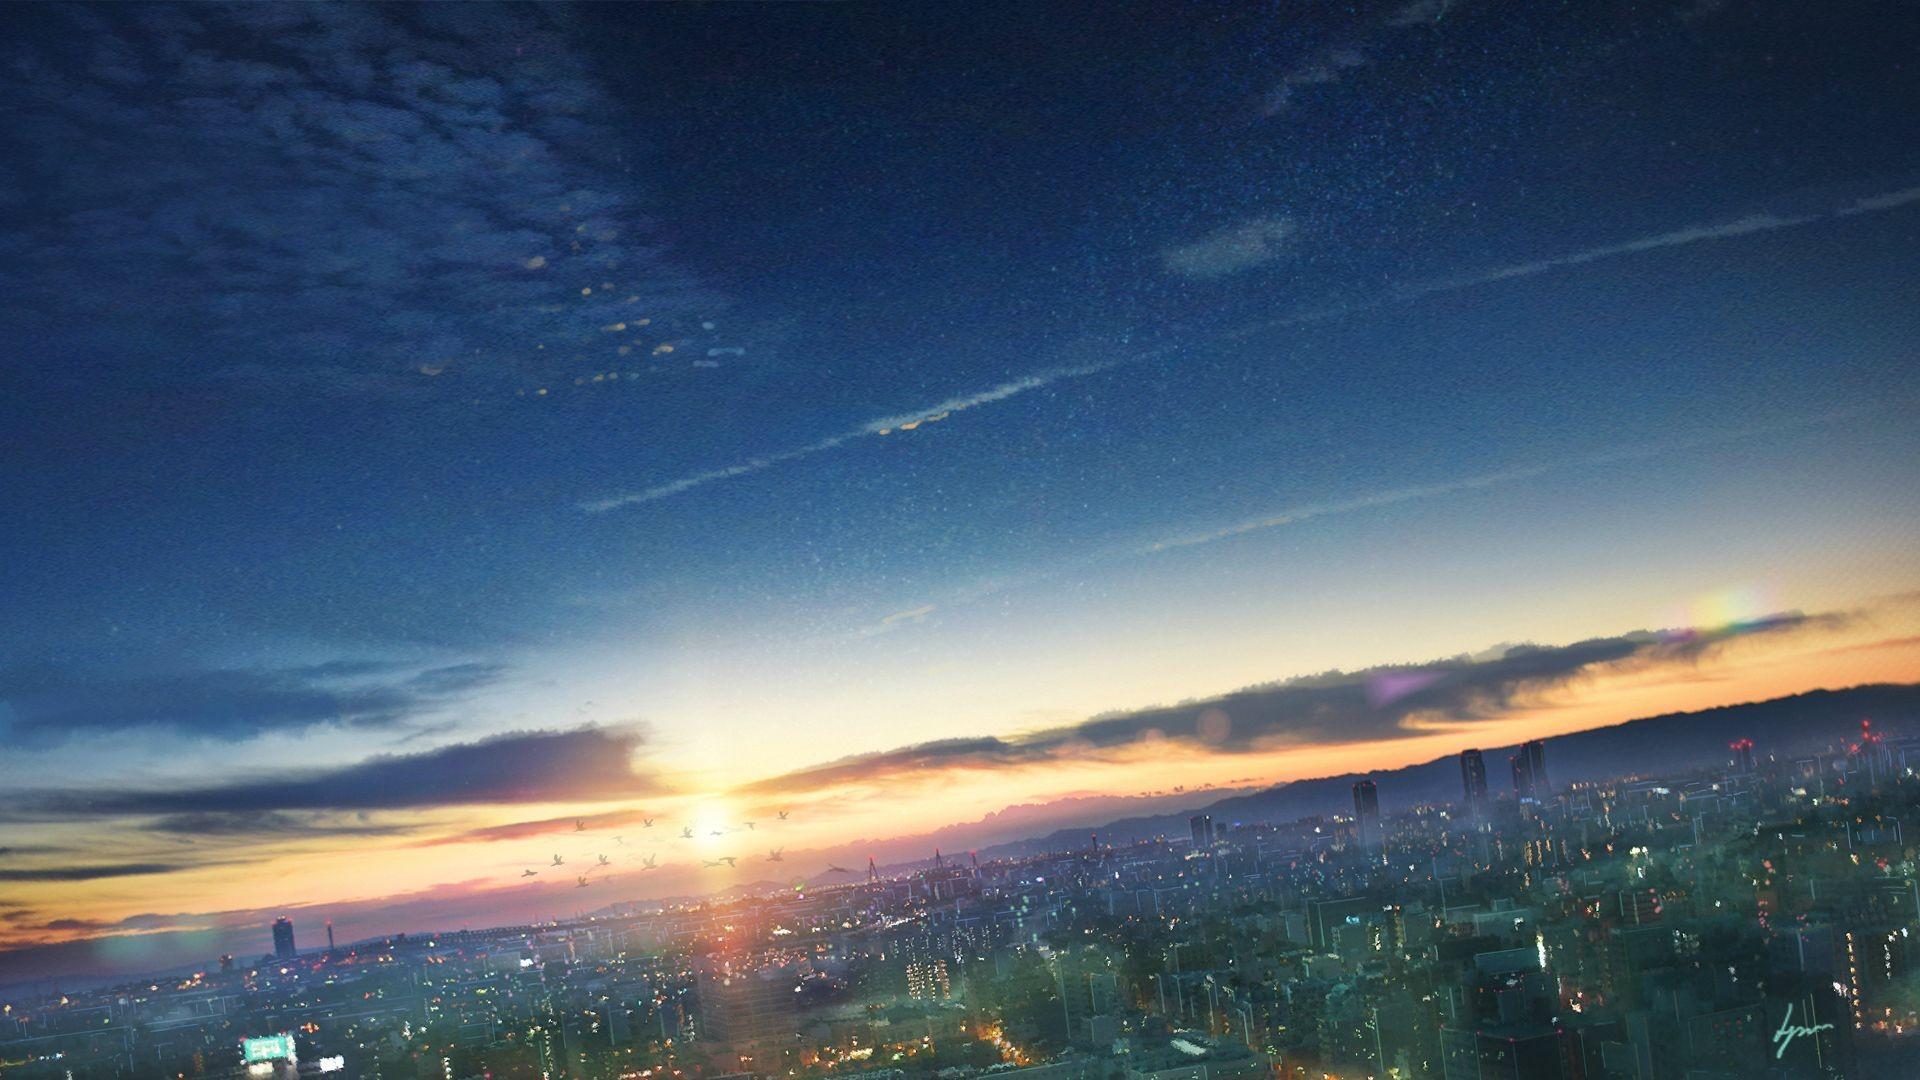 Fantasy - City  Cityscape Sunset Sky Cloud Light Wallpaper